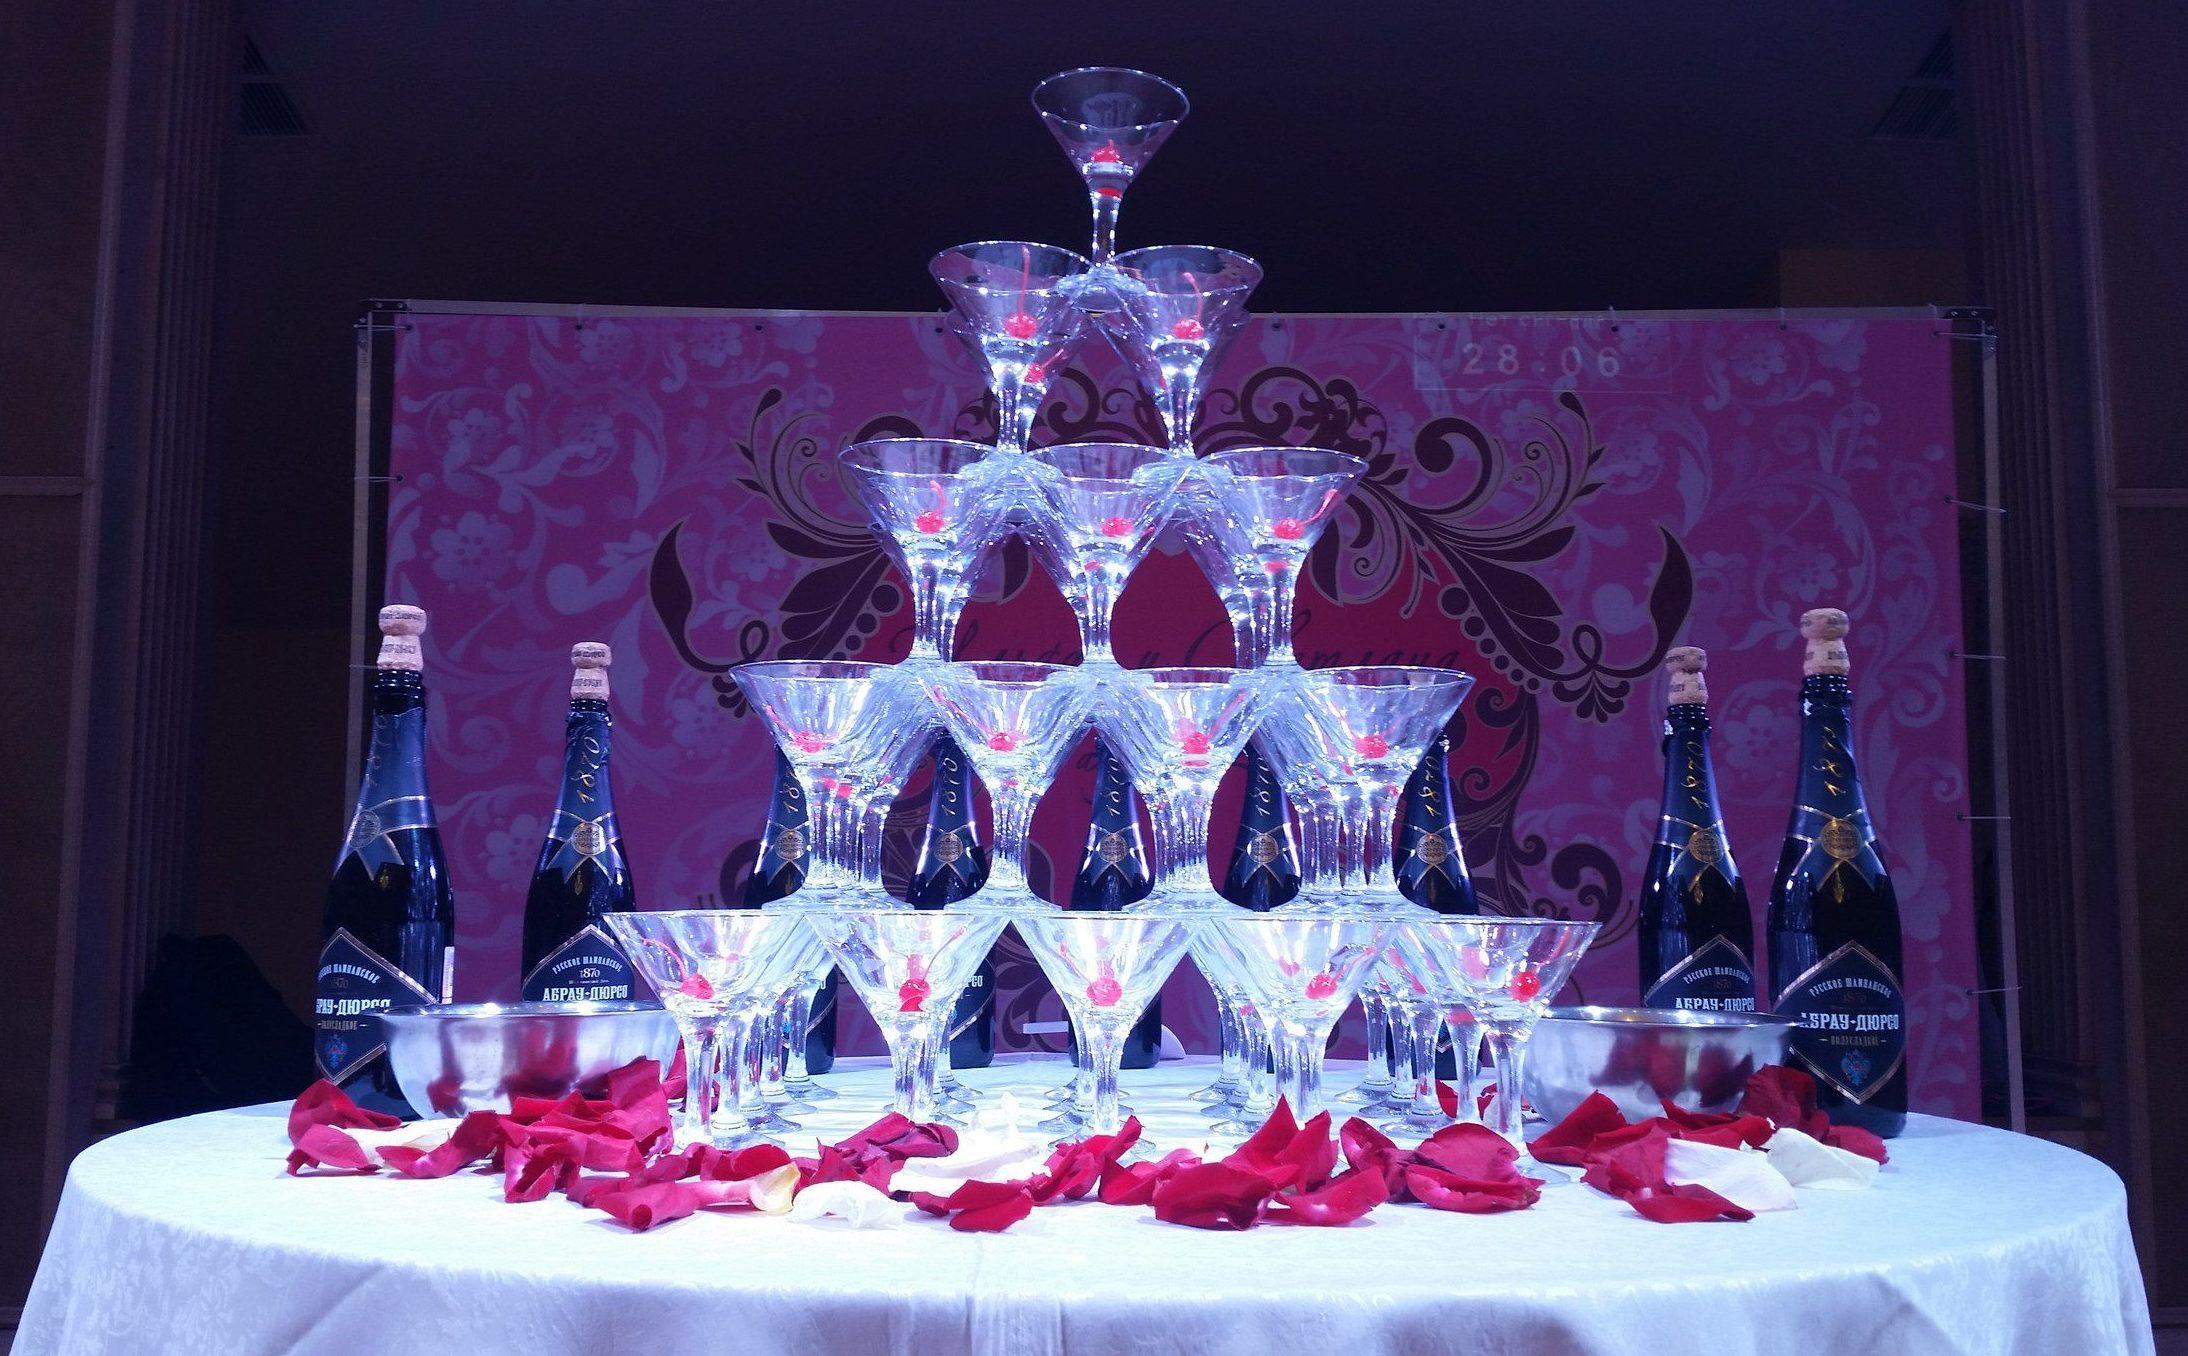 Пирамида шампанского, горка шампкнского